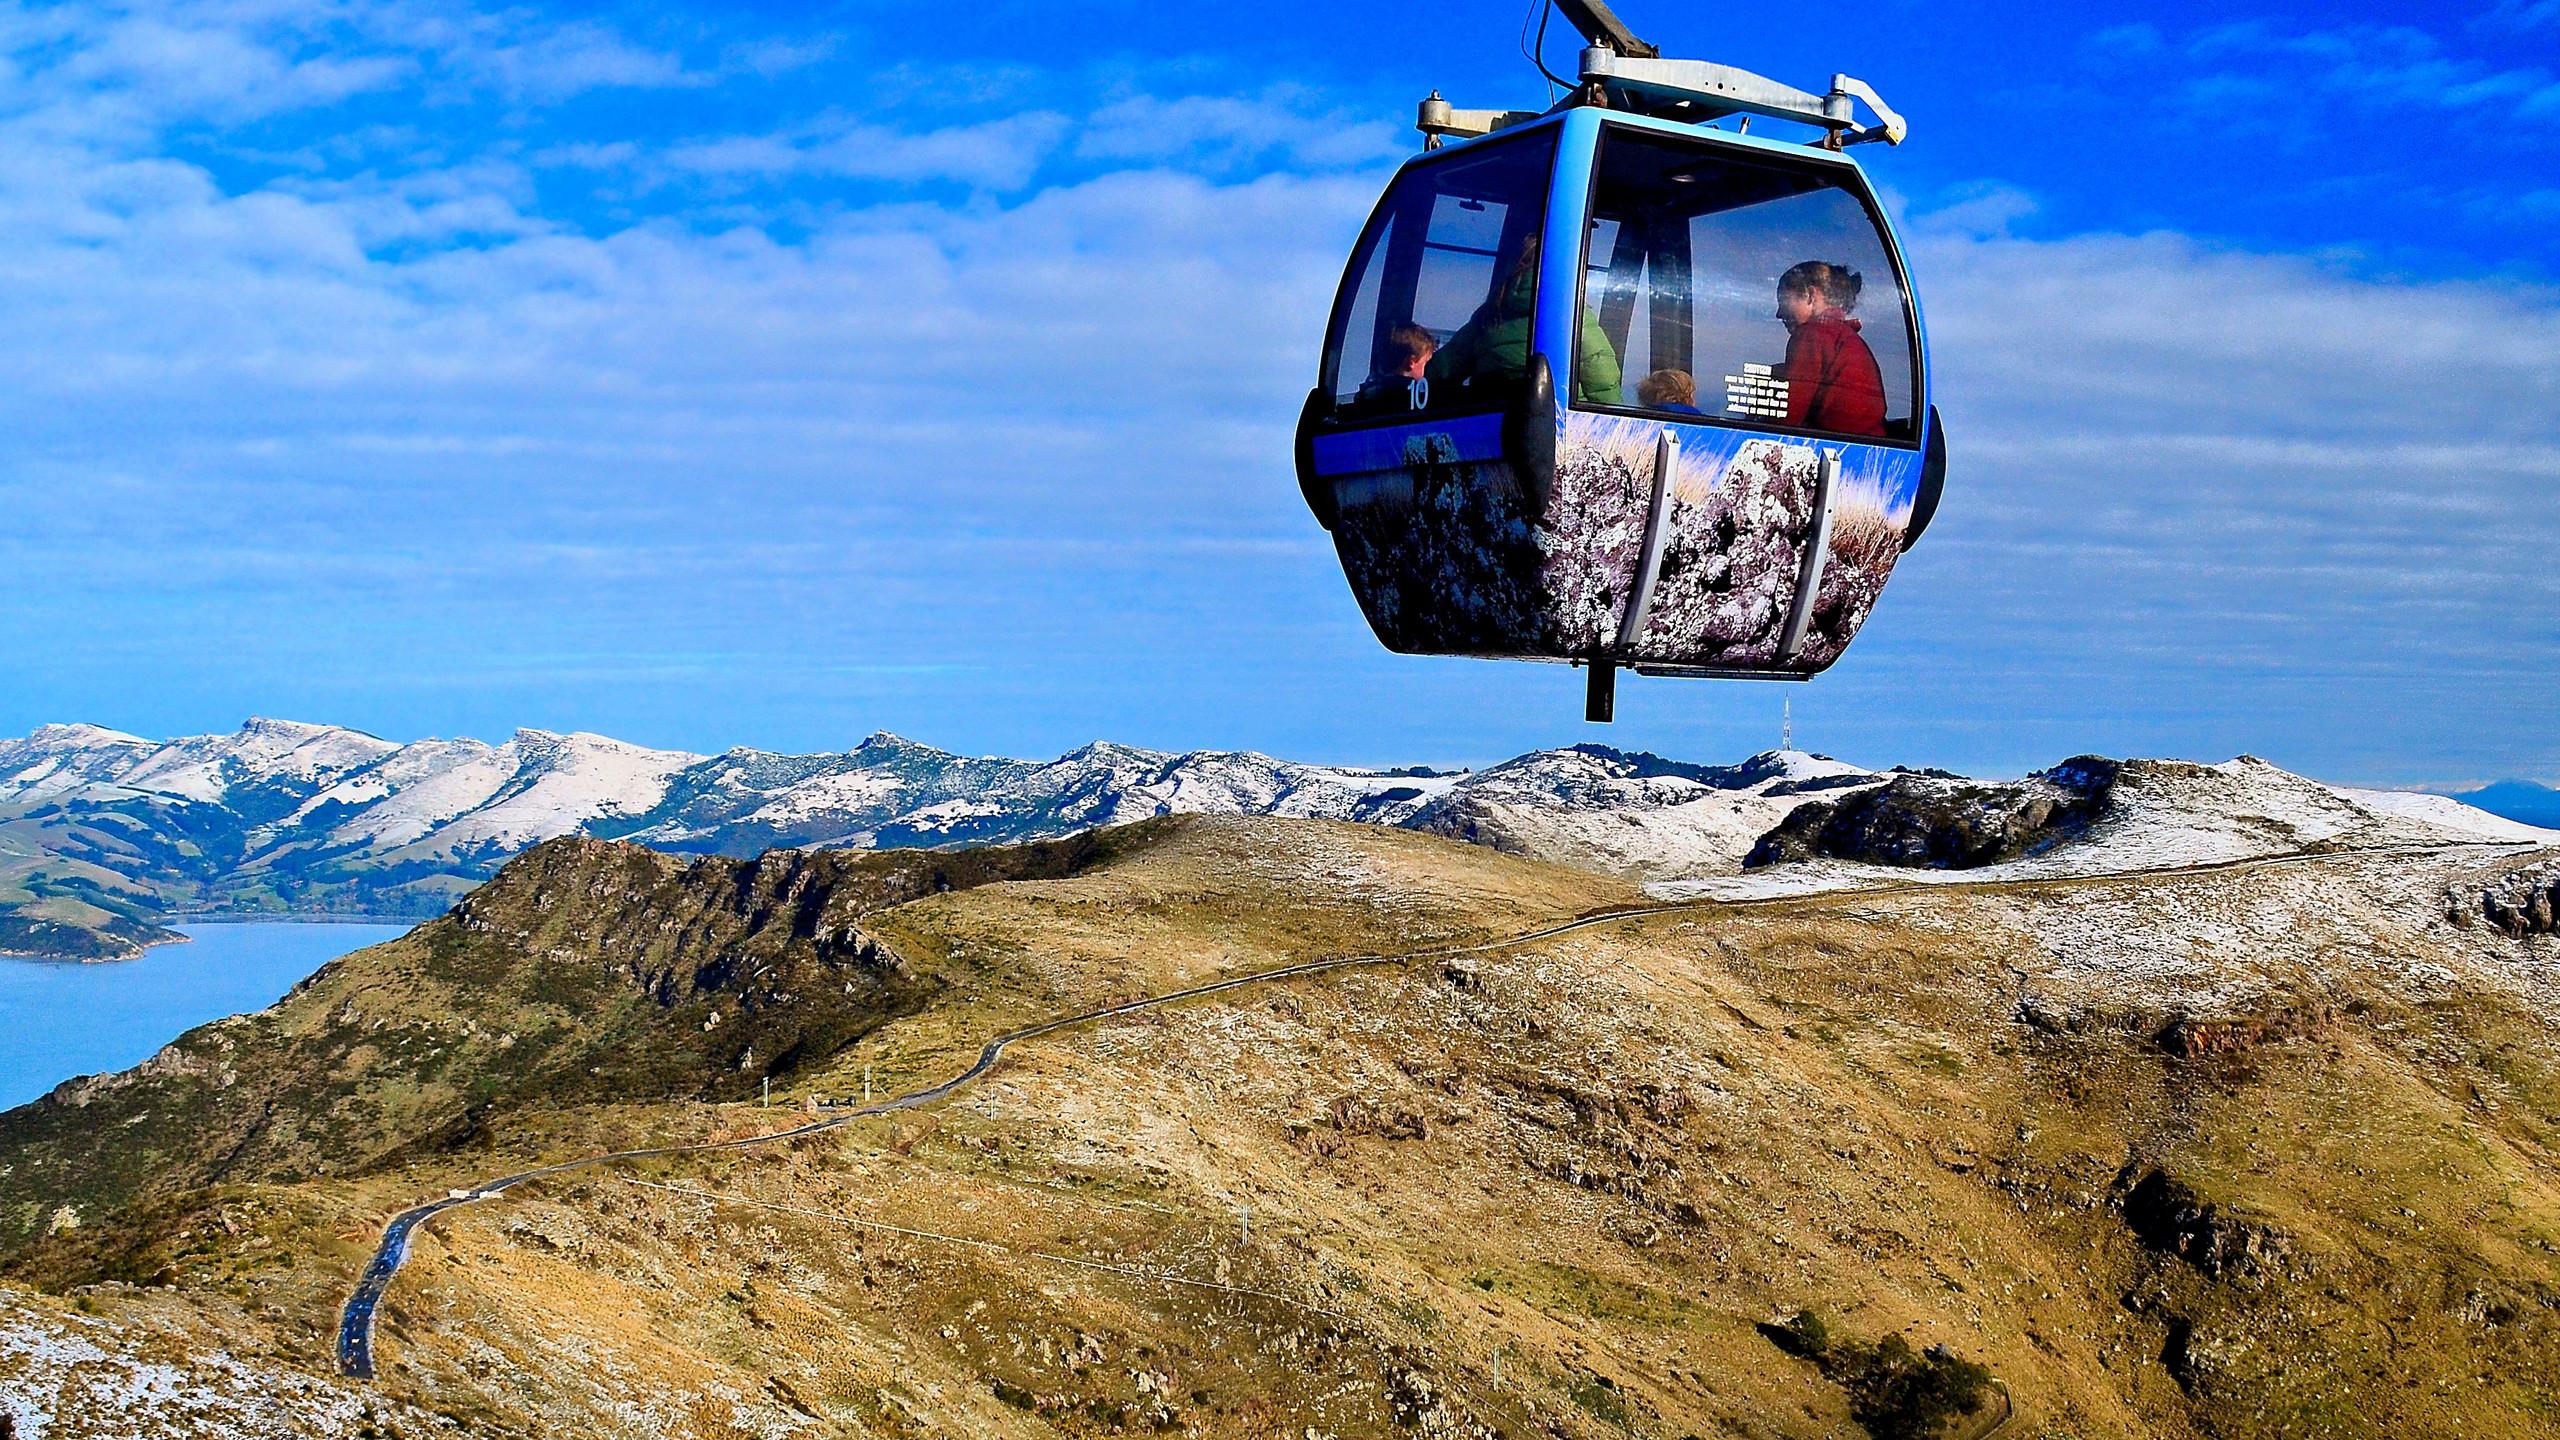 Christchurch Gondola, New Zealand activities, New Zealand tours